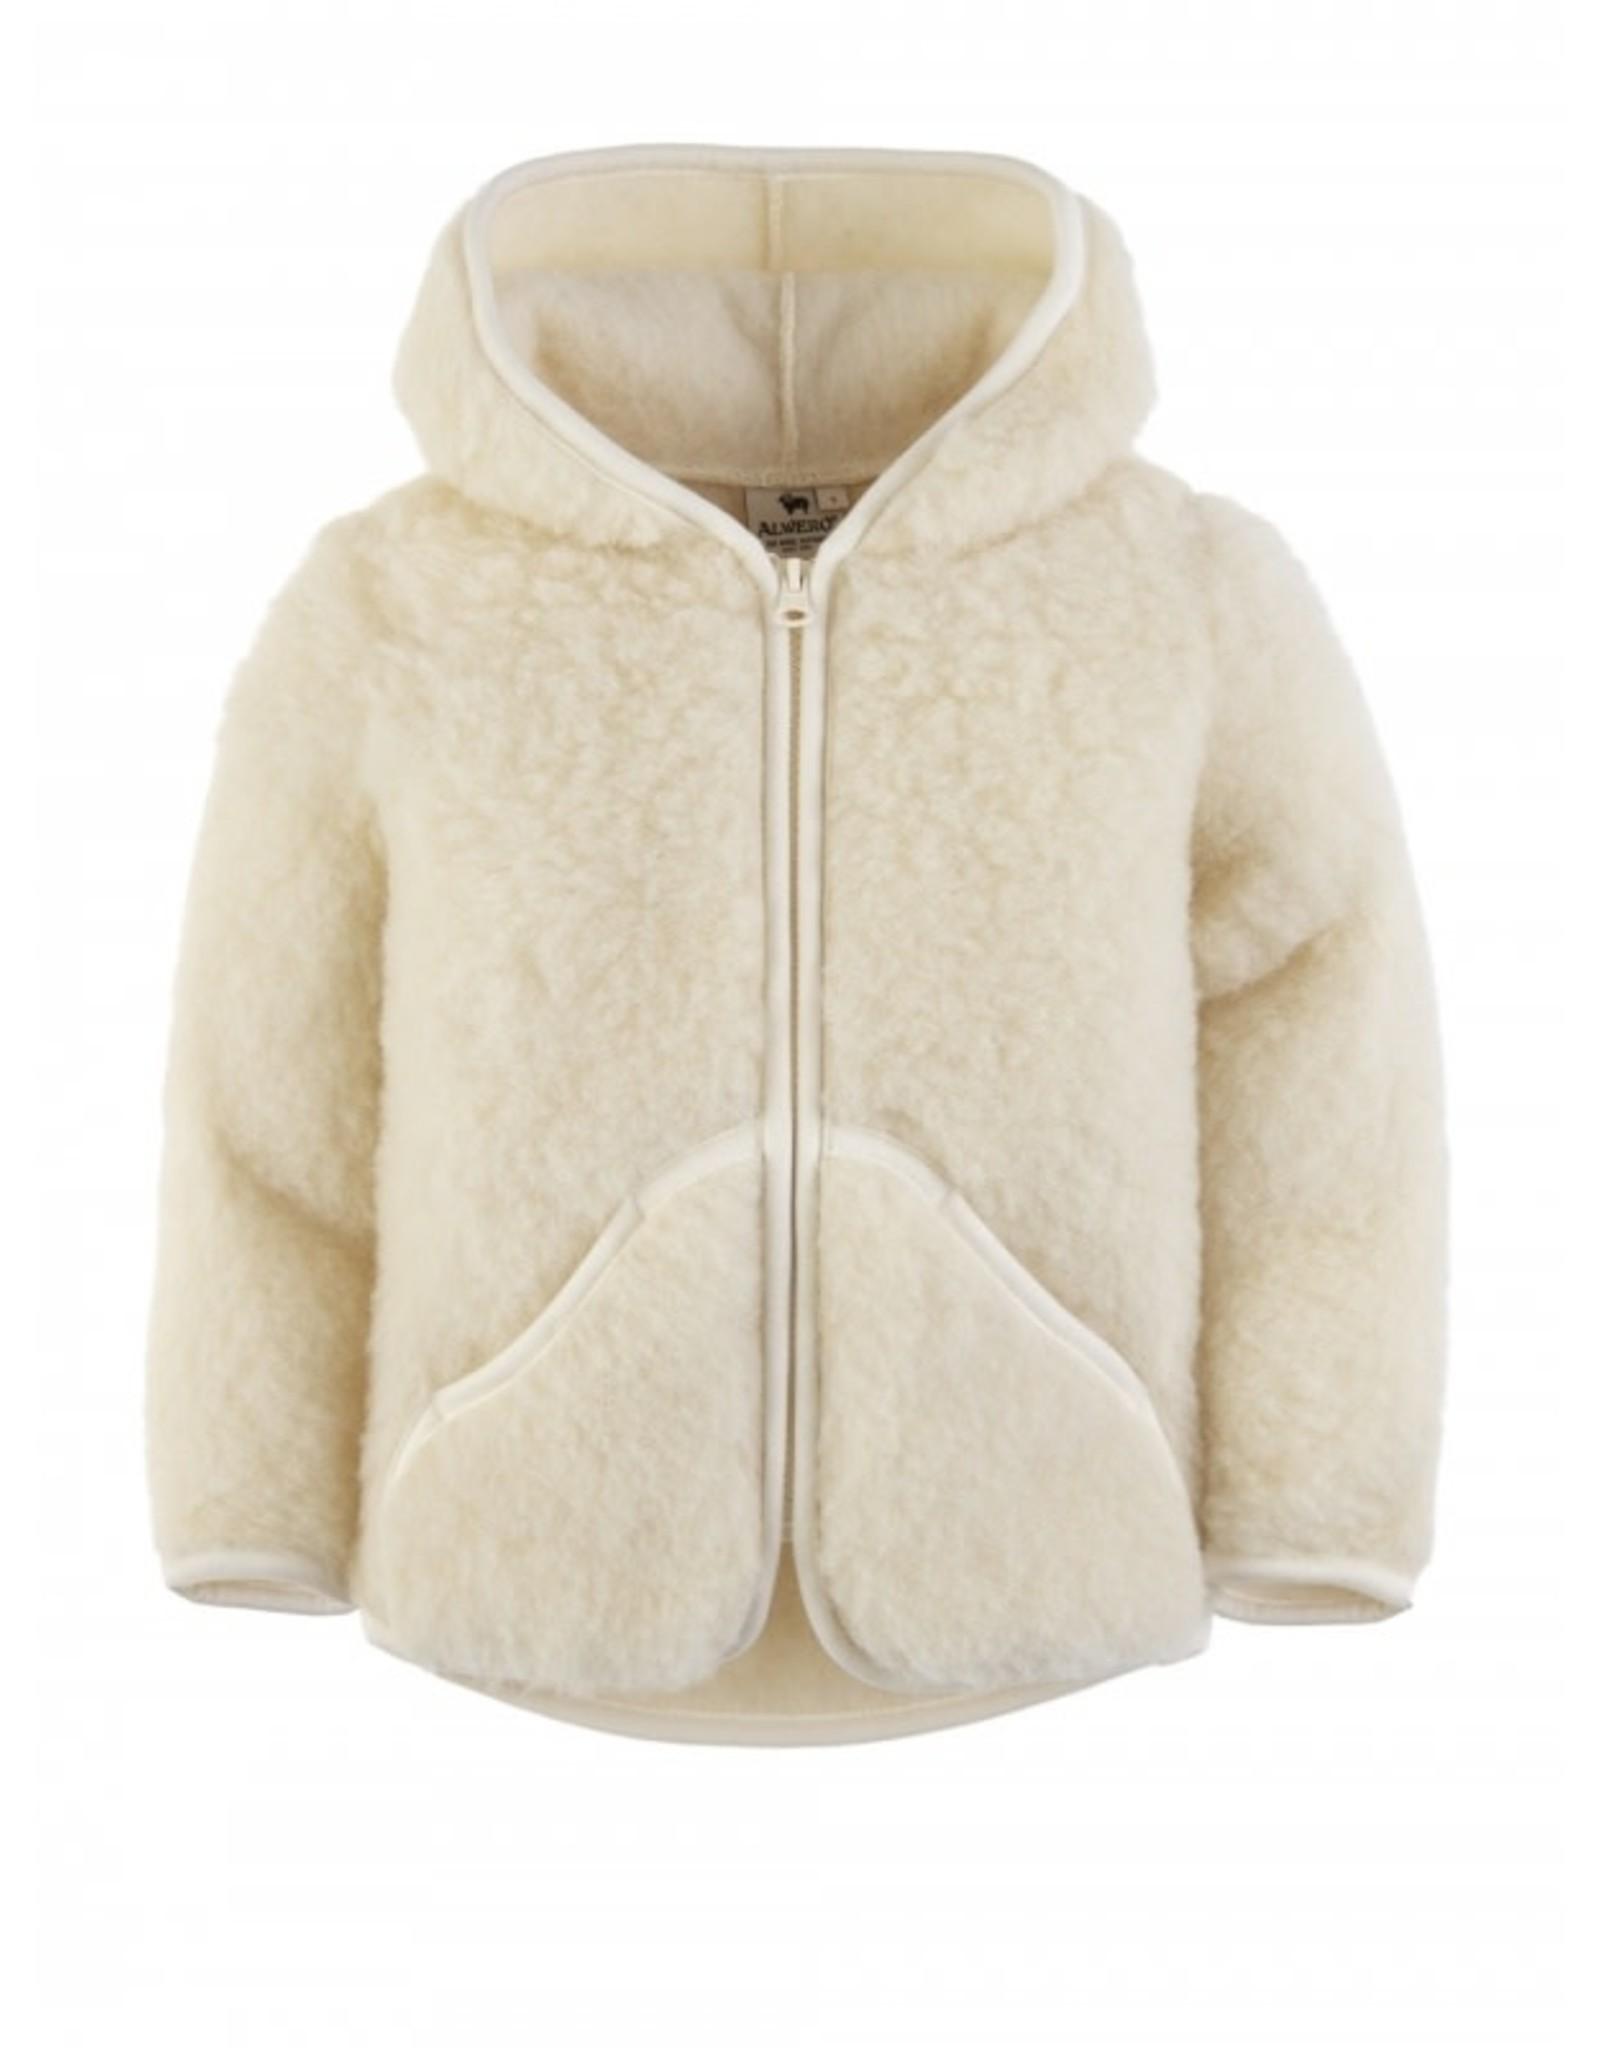 Alwero Childrens Coat/Cardigan 'Mody'